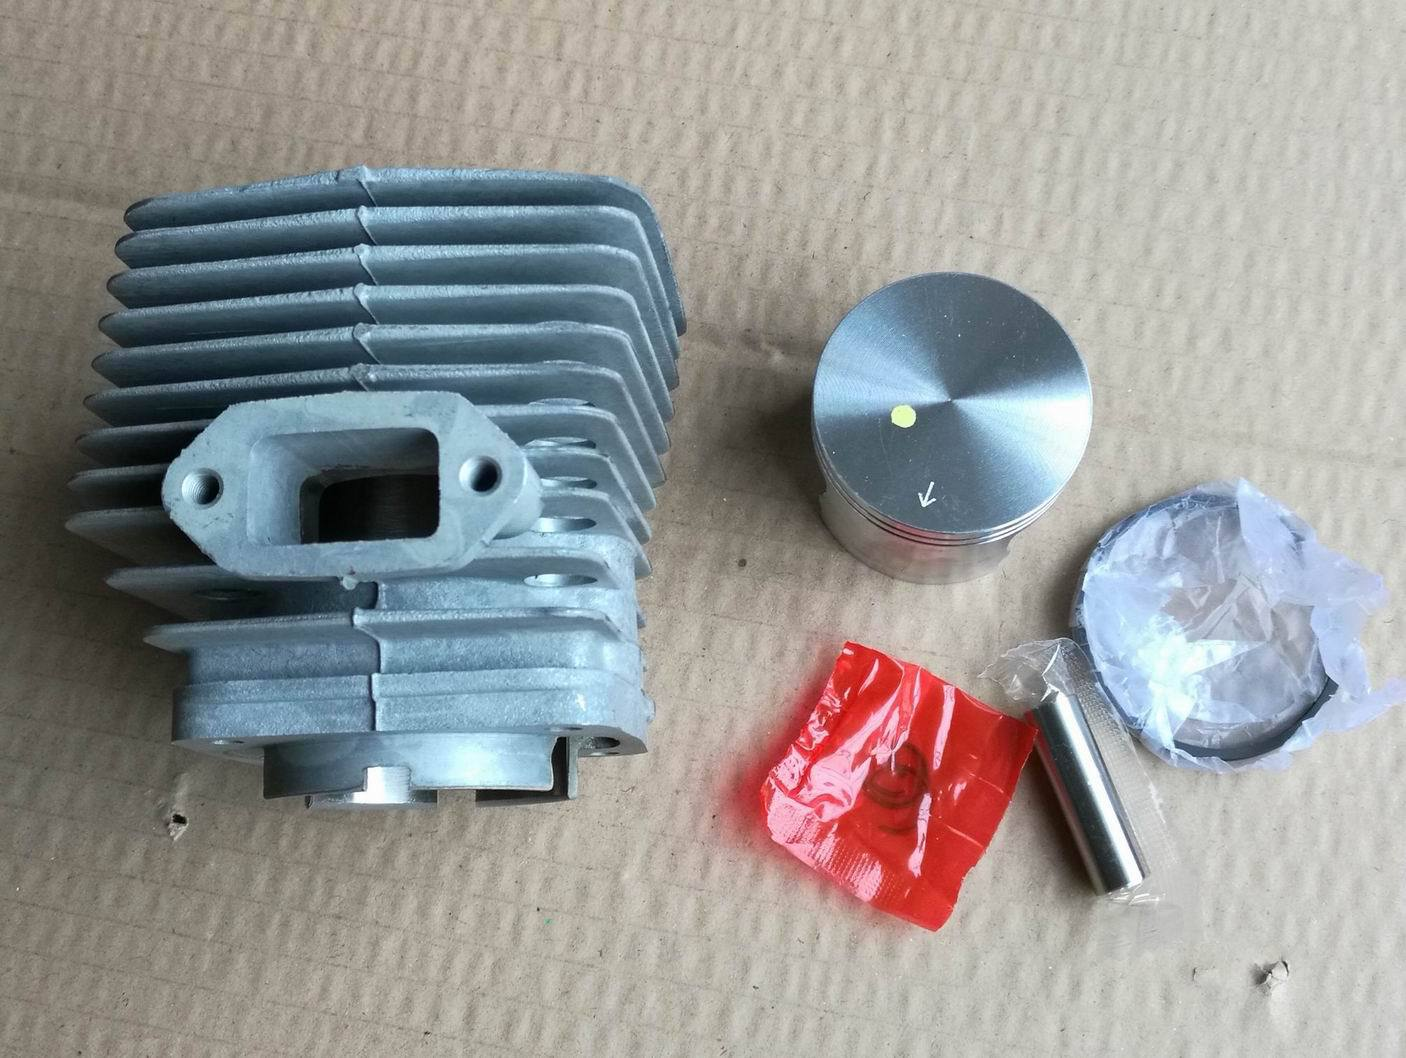 Cilindro para stihl fs550, fs420 (46mm) nikasil chapeado cilindro kit